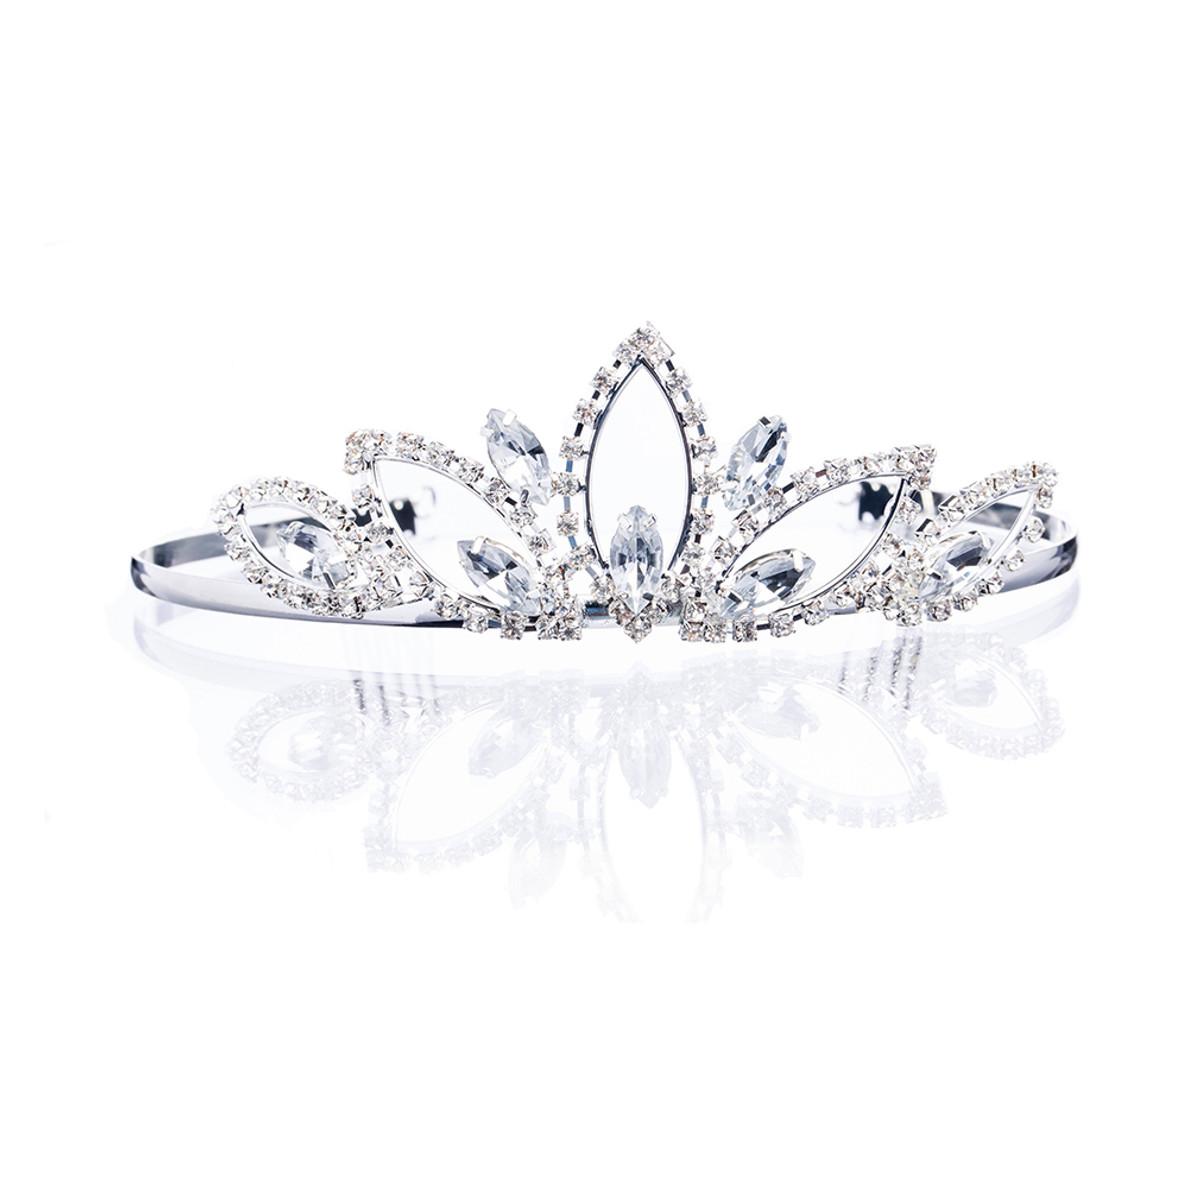 Accessoriesforever Bridal Wedding Jewelry Crystal Rhinestone Wide